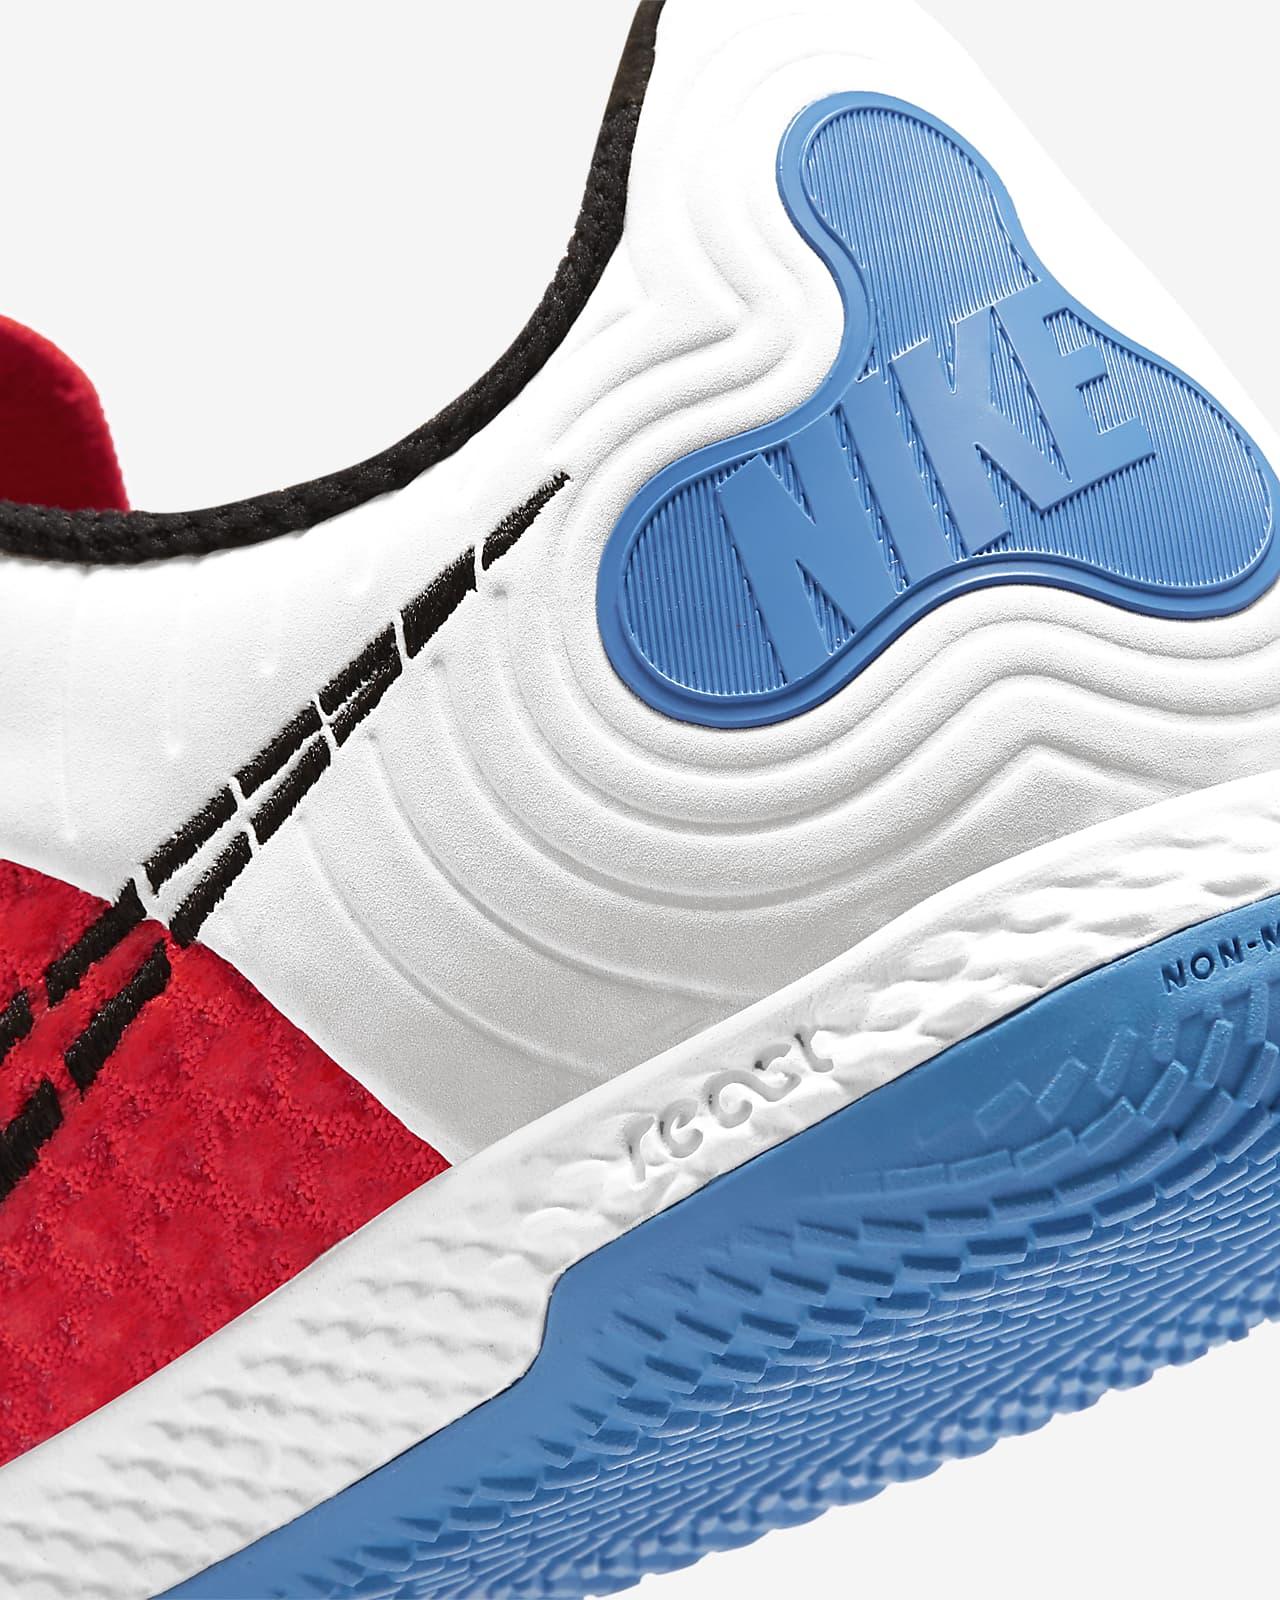 Chaussure de football en salle Nike React Gato